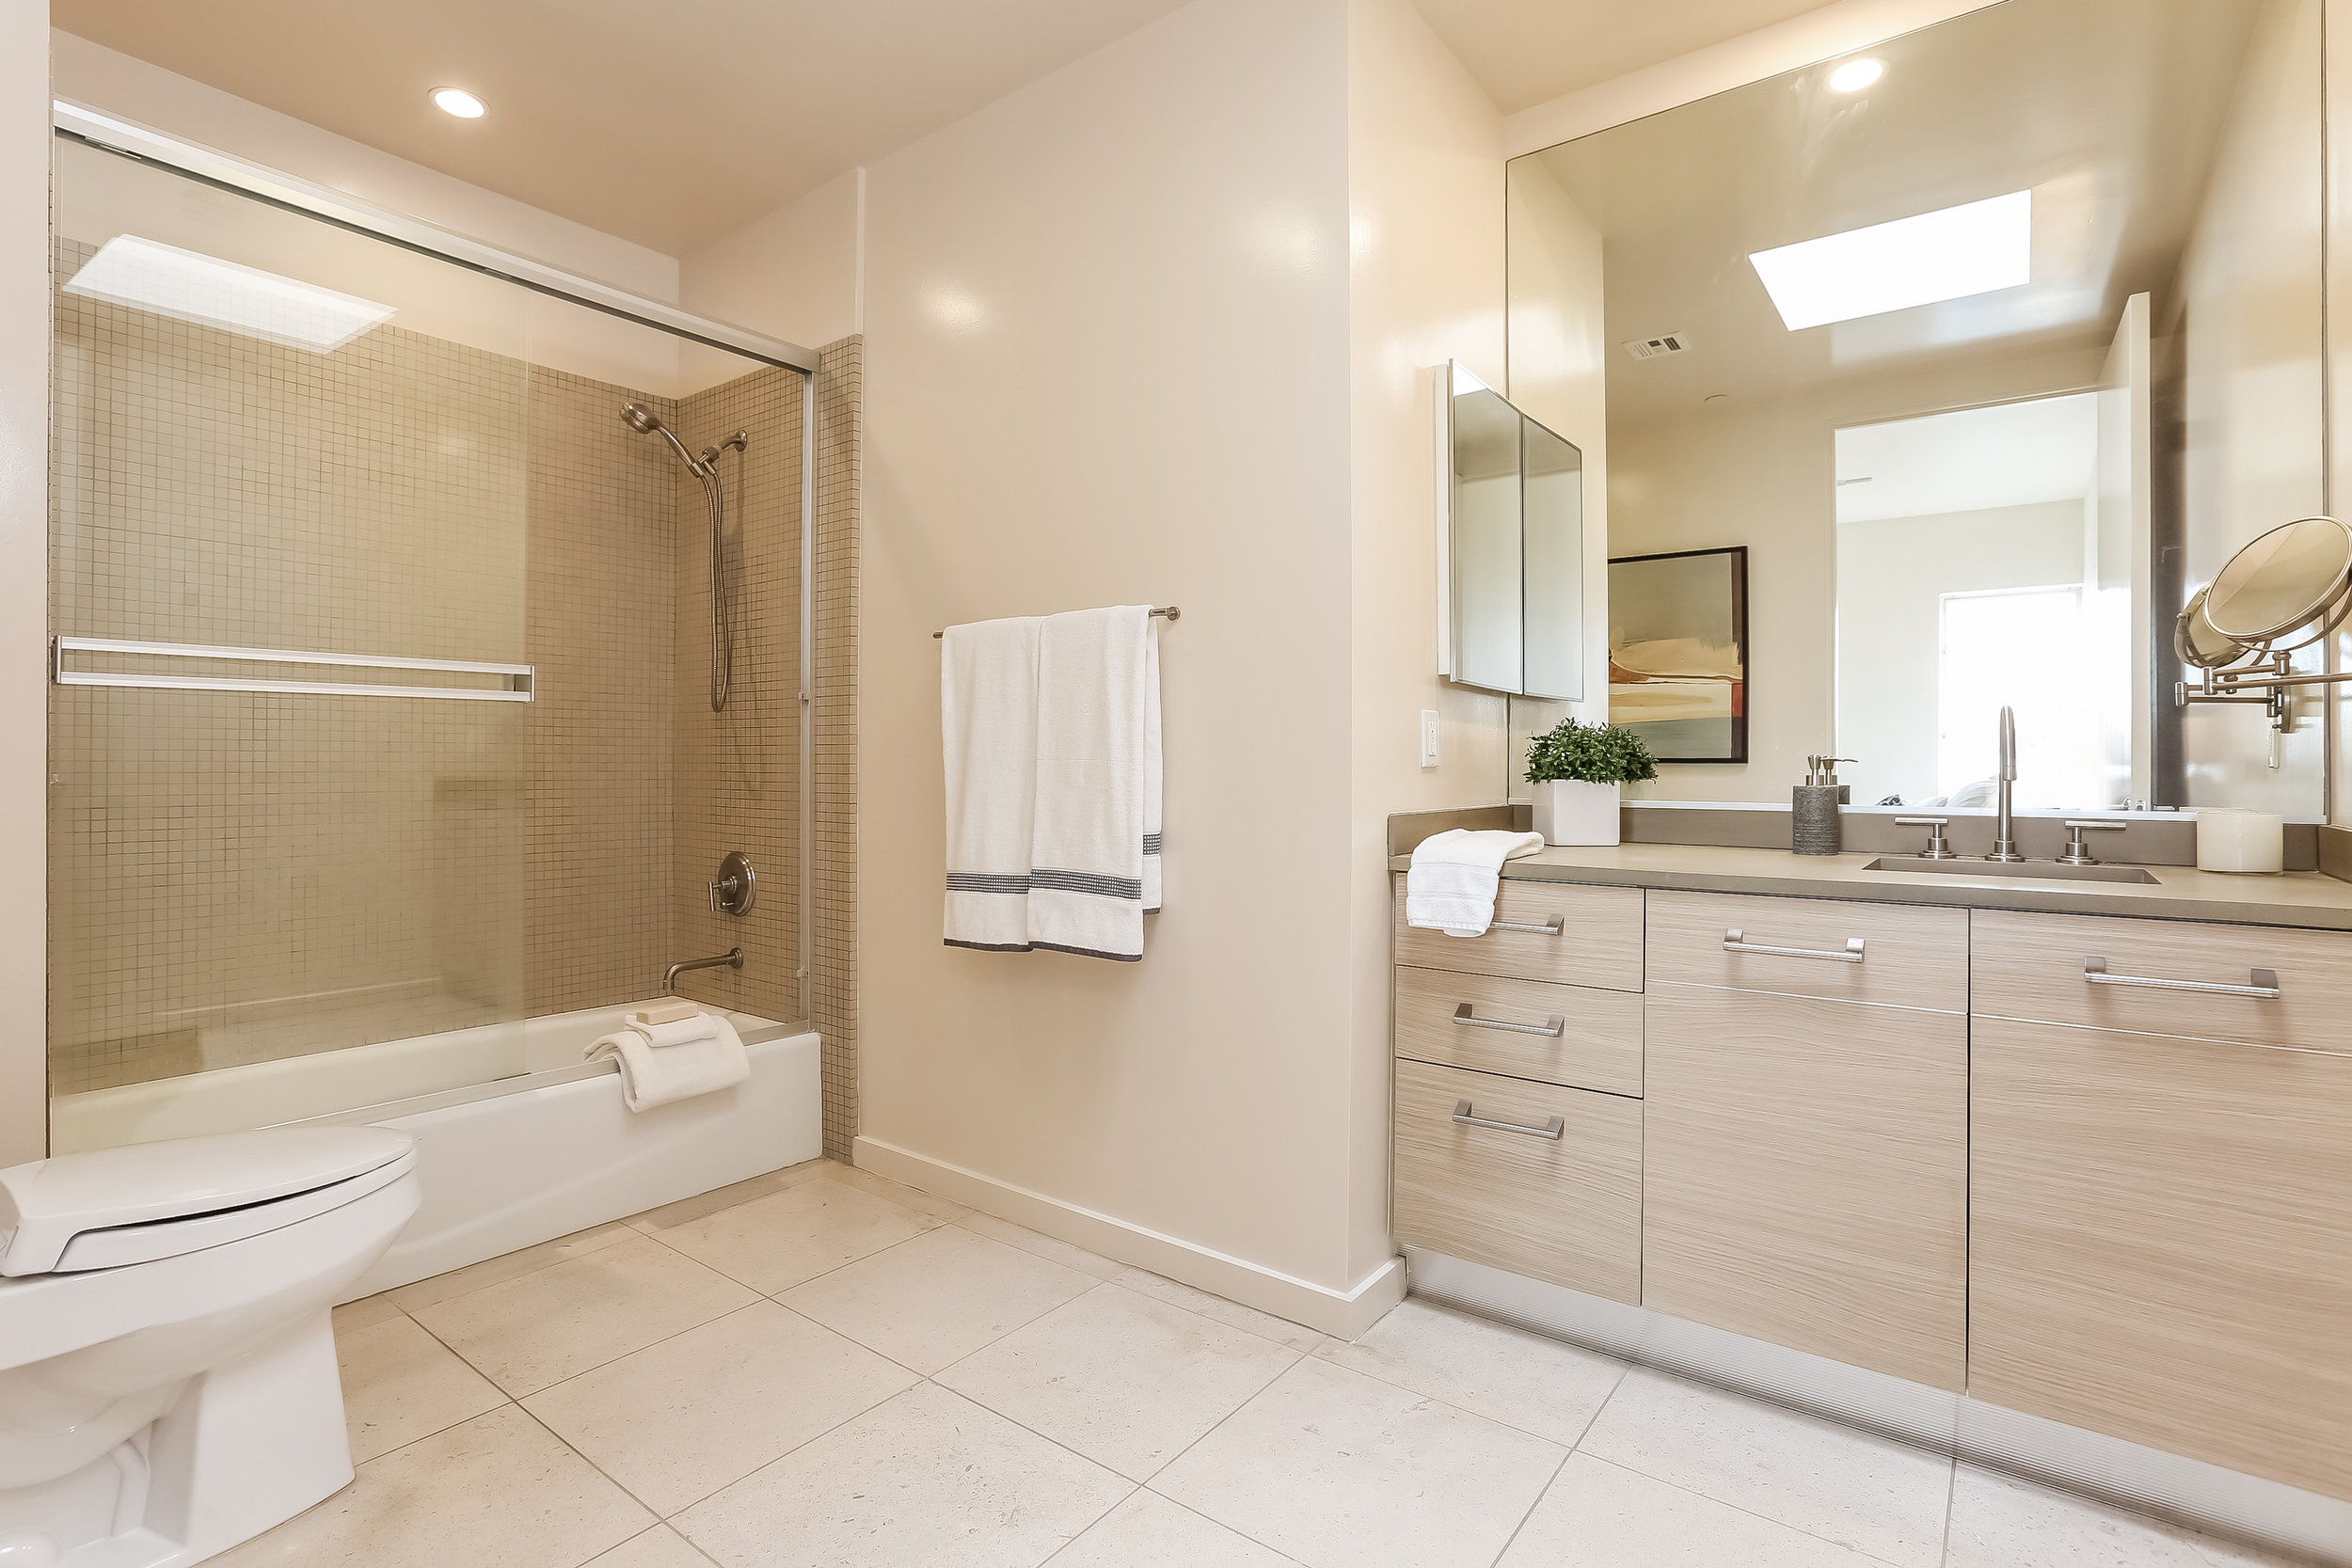 023-photo-master-bathroom-6209690 copy.jpg